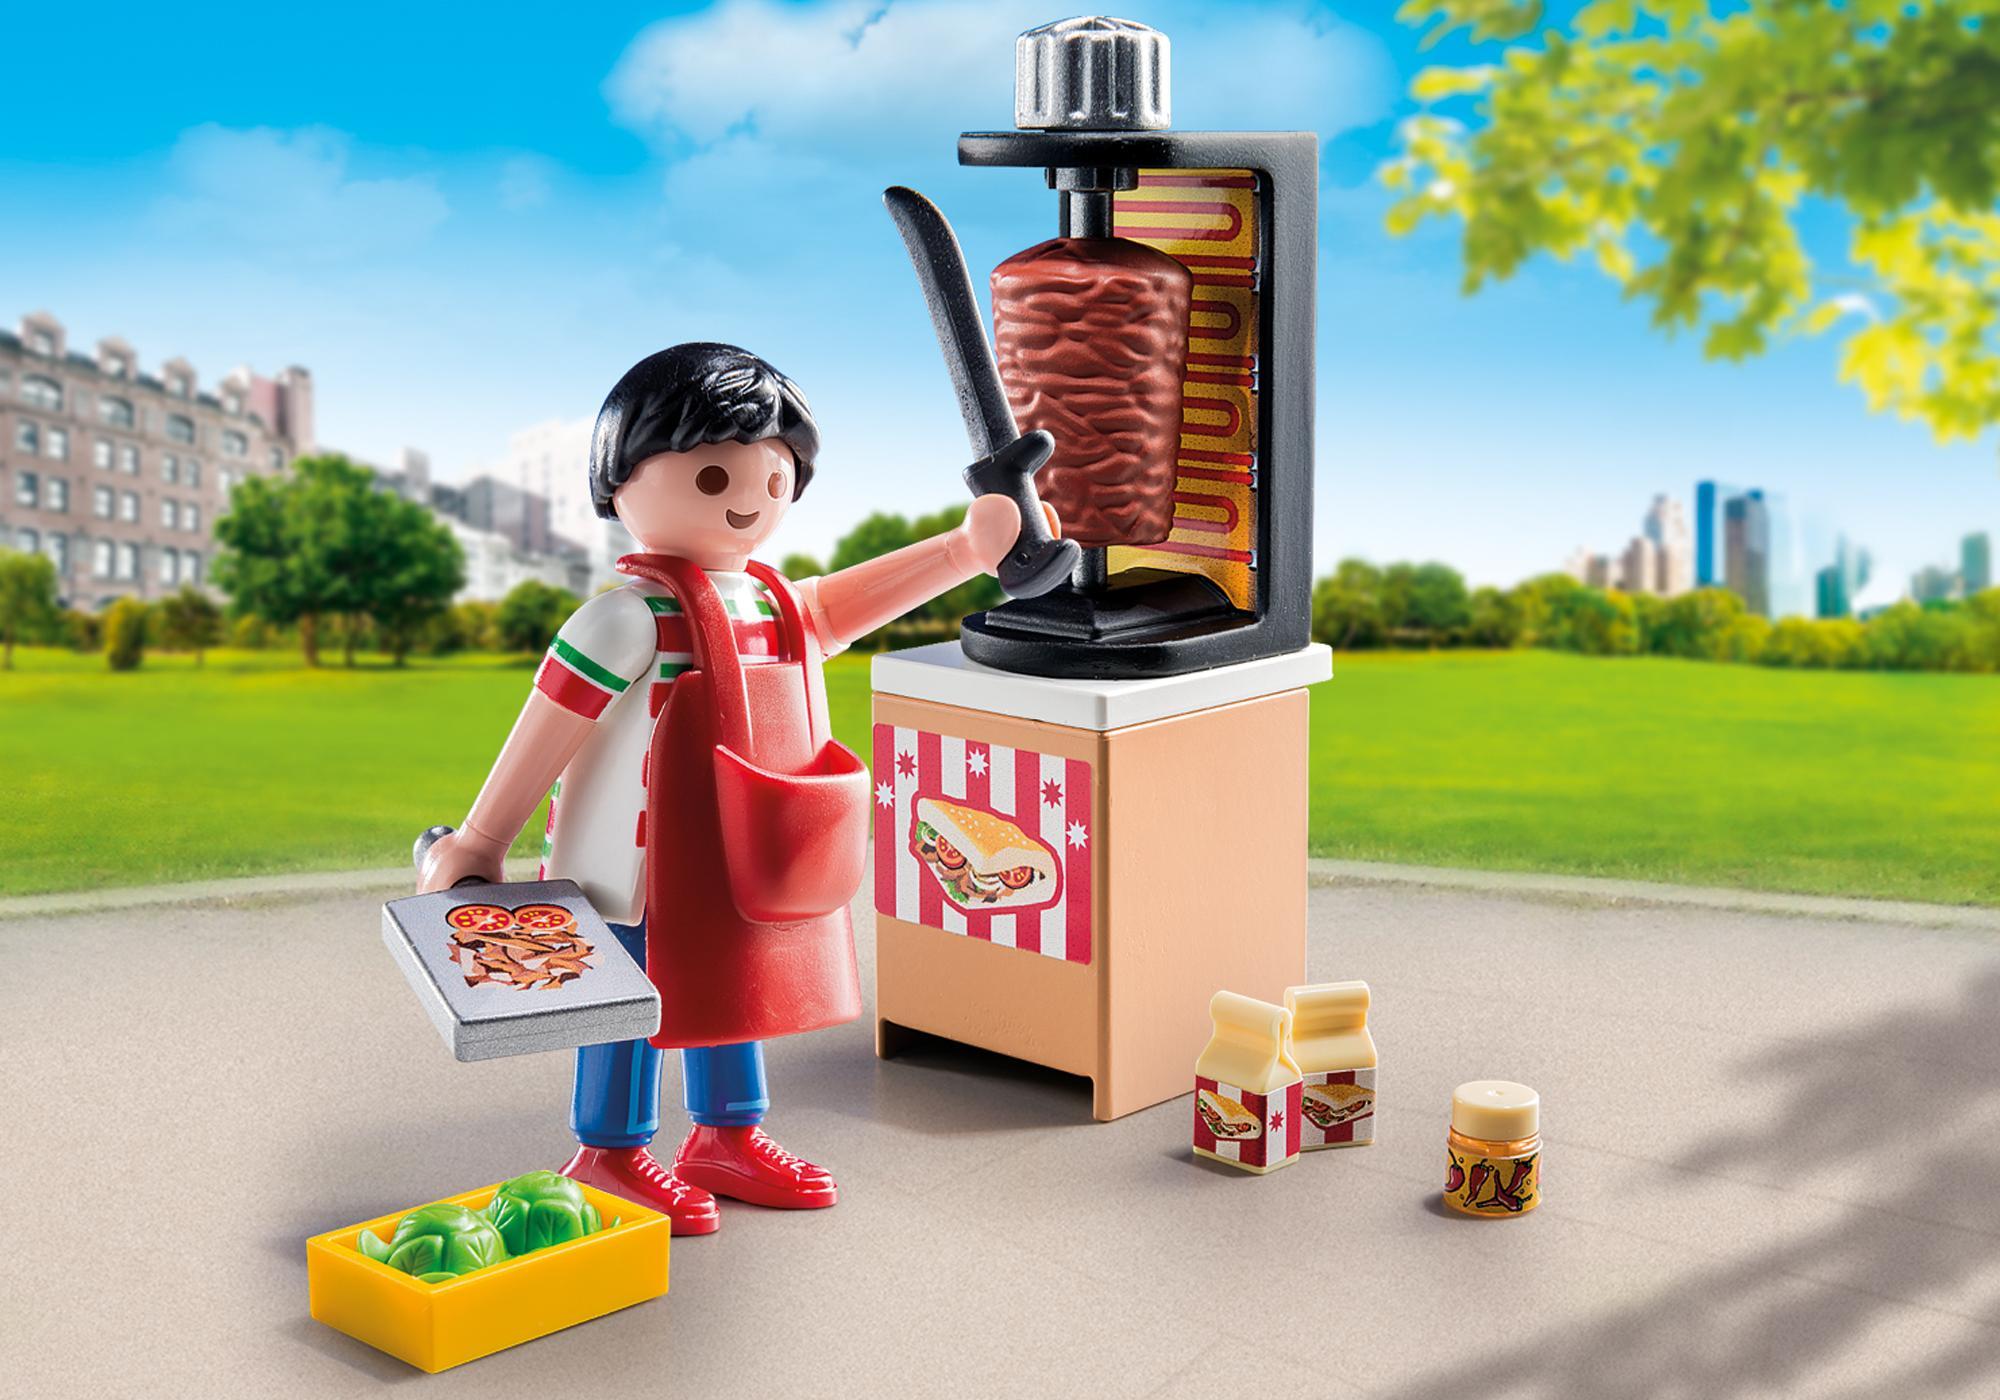 http://media.playmobil.com/i/playmobil/9088_product_detail/Kebap-Grill